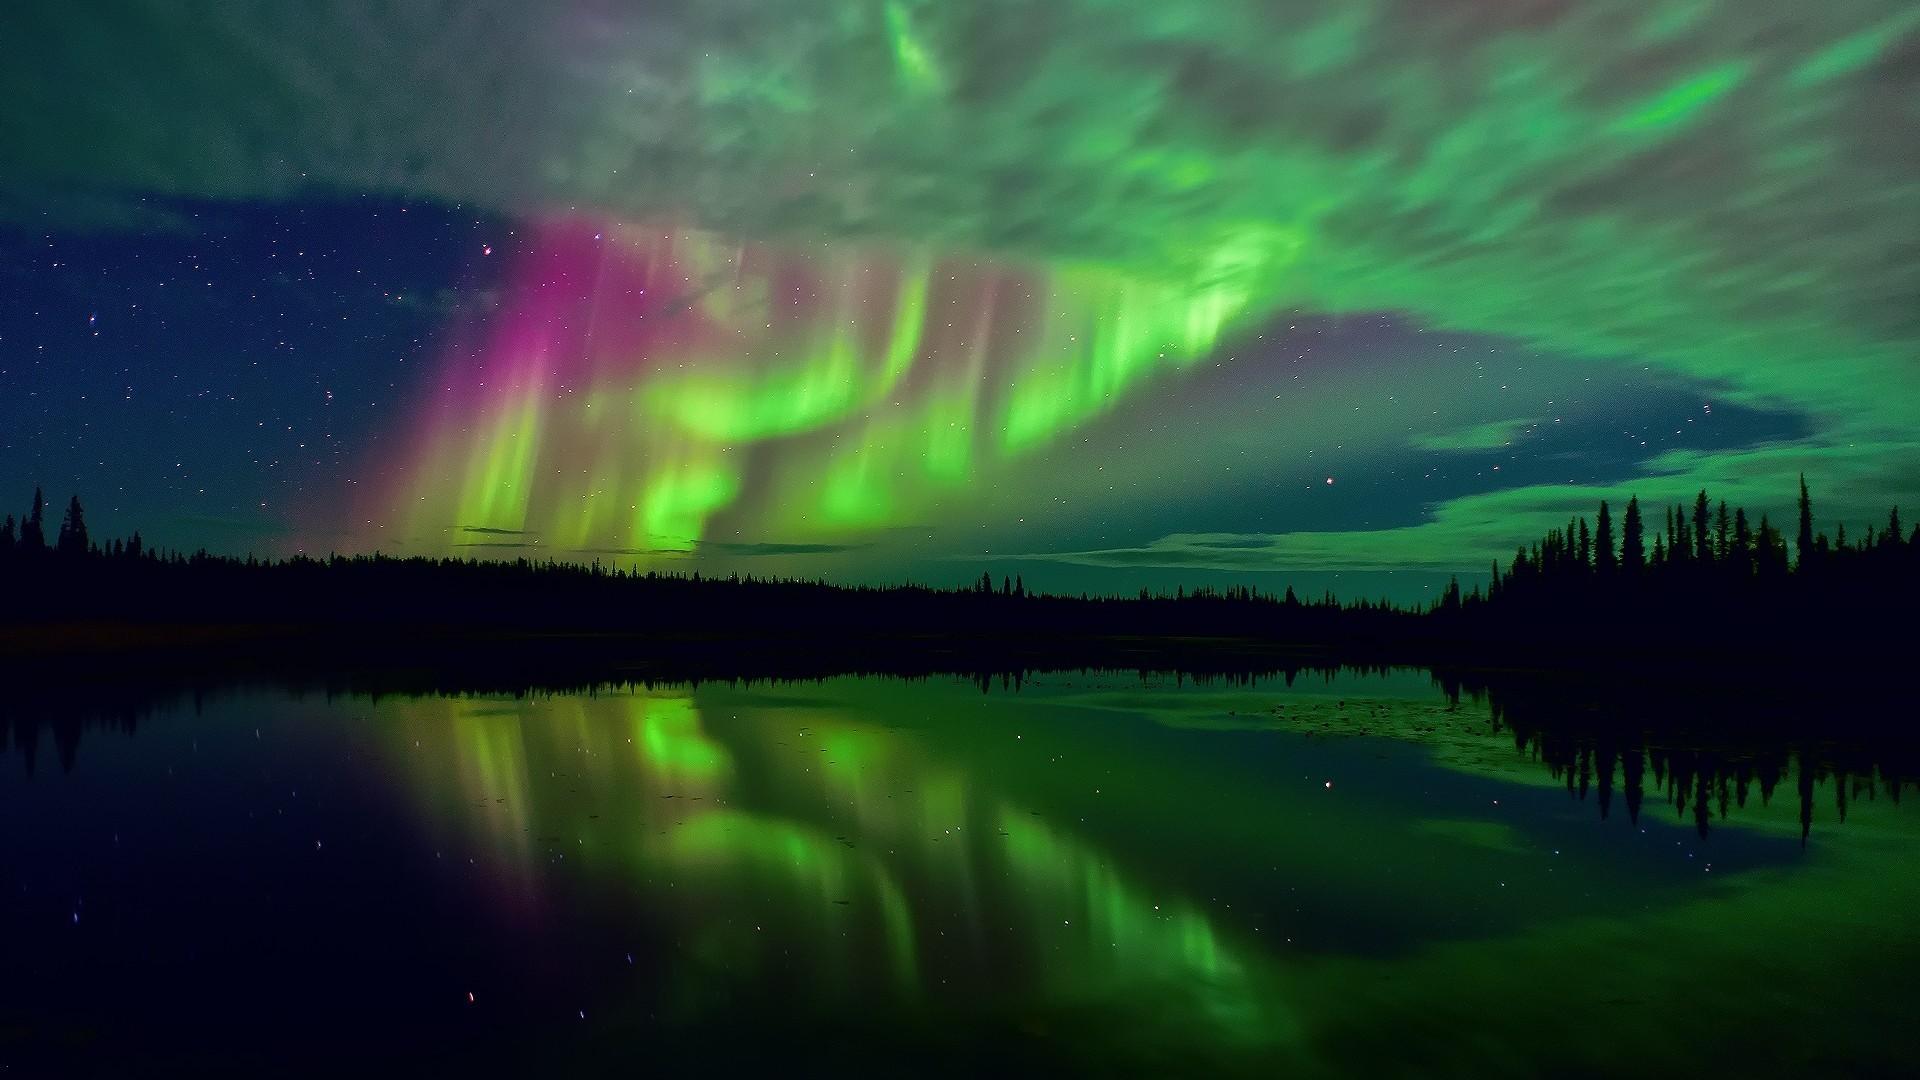 Aurora Borealis Northern Lights Wallpaper - wallpaper